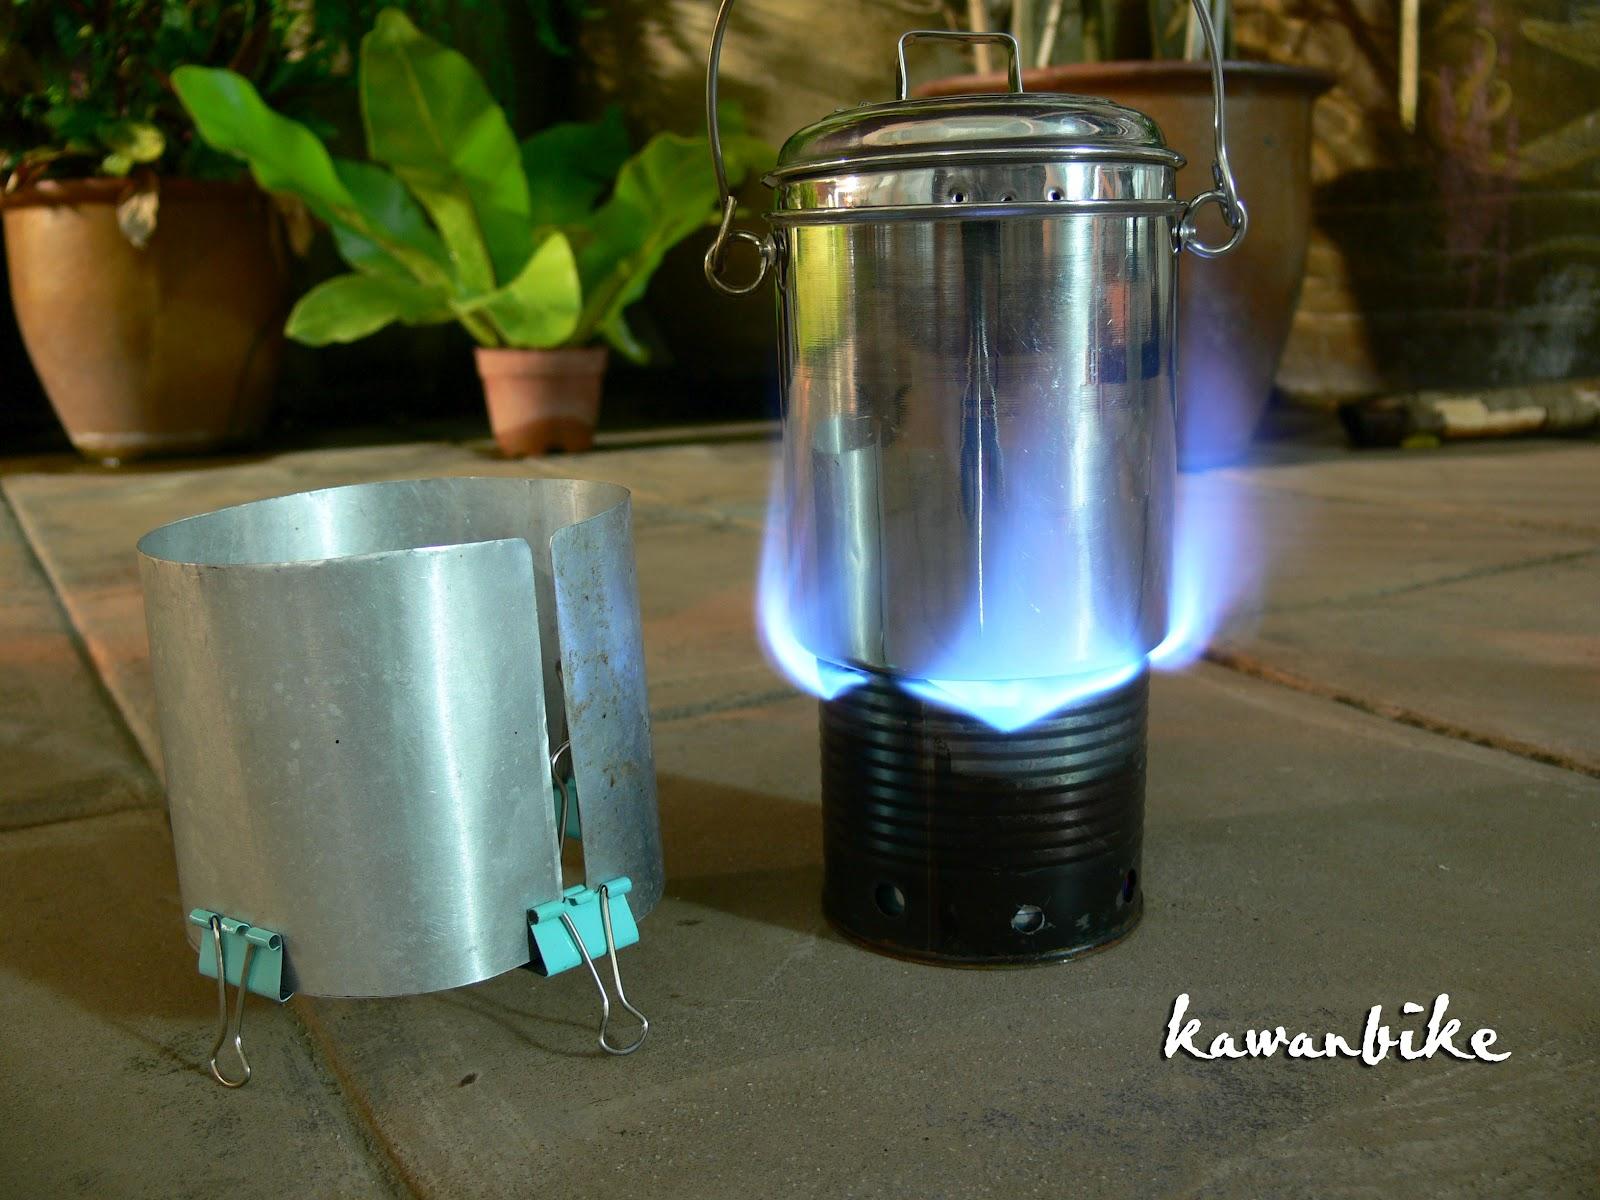 Kawanbike ultralight diy stove mini cook kit for Diy cooking stove